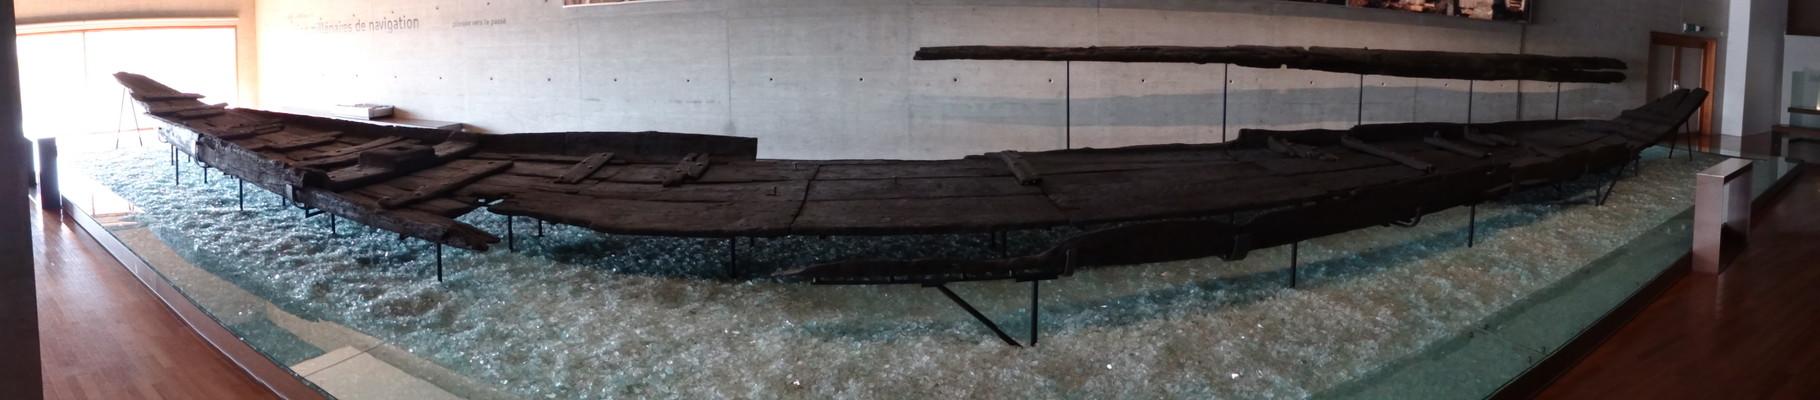 galo-roman barge (barcaza, Lastkahn)...